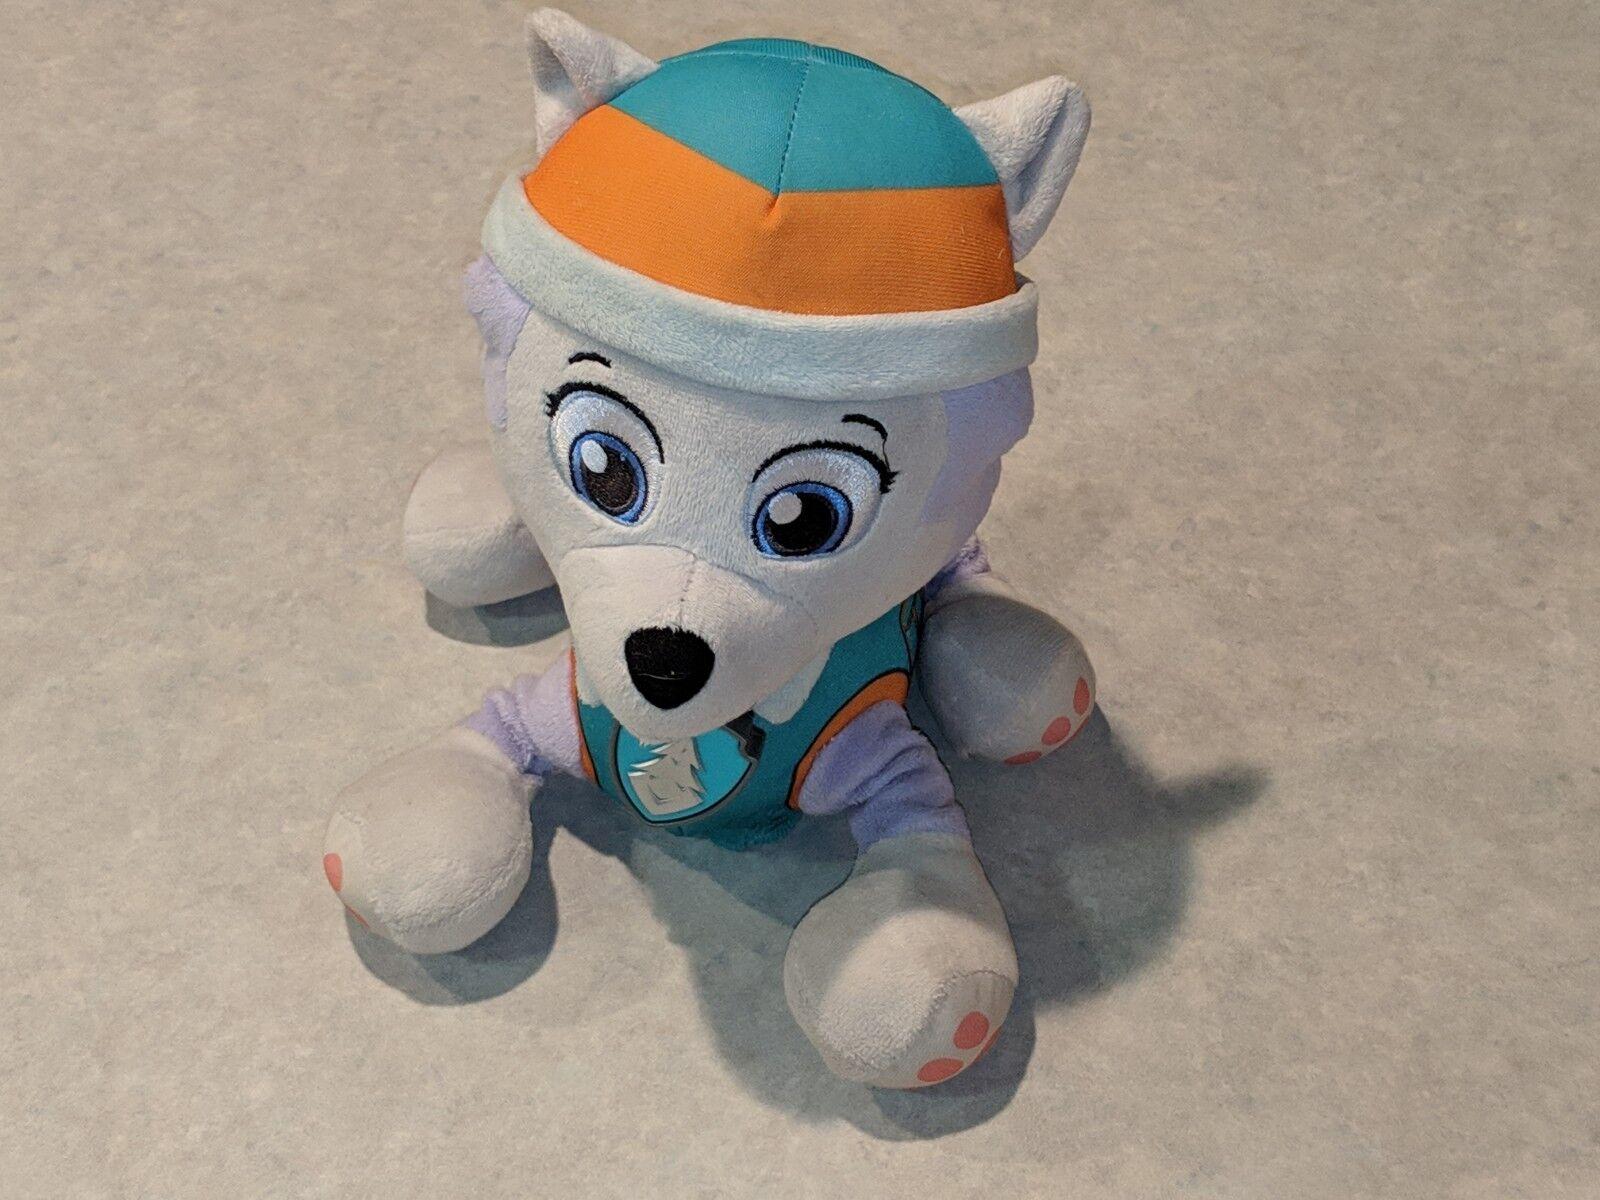 EVEREST PAW PATROL Real Talking Plush Doll Stuffed Animal Dog 2015 Spin Master